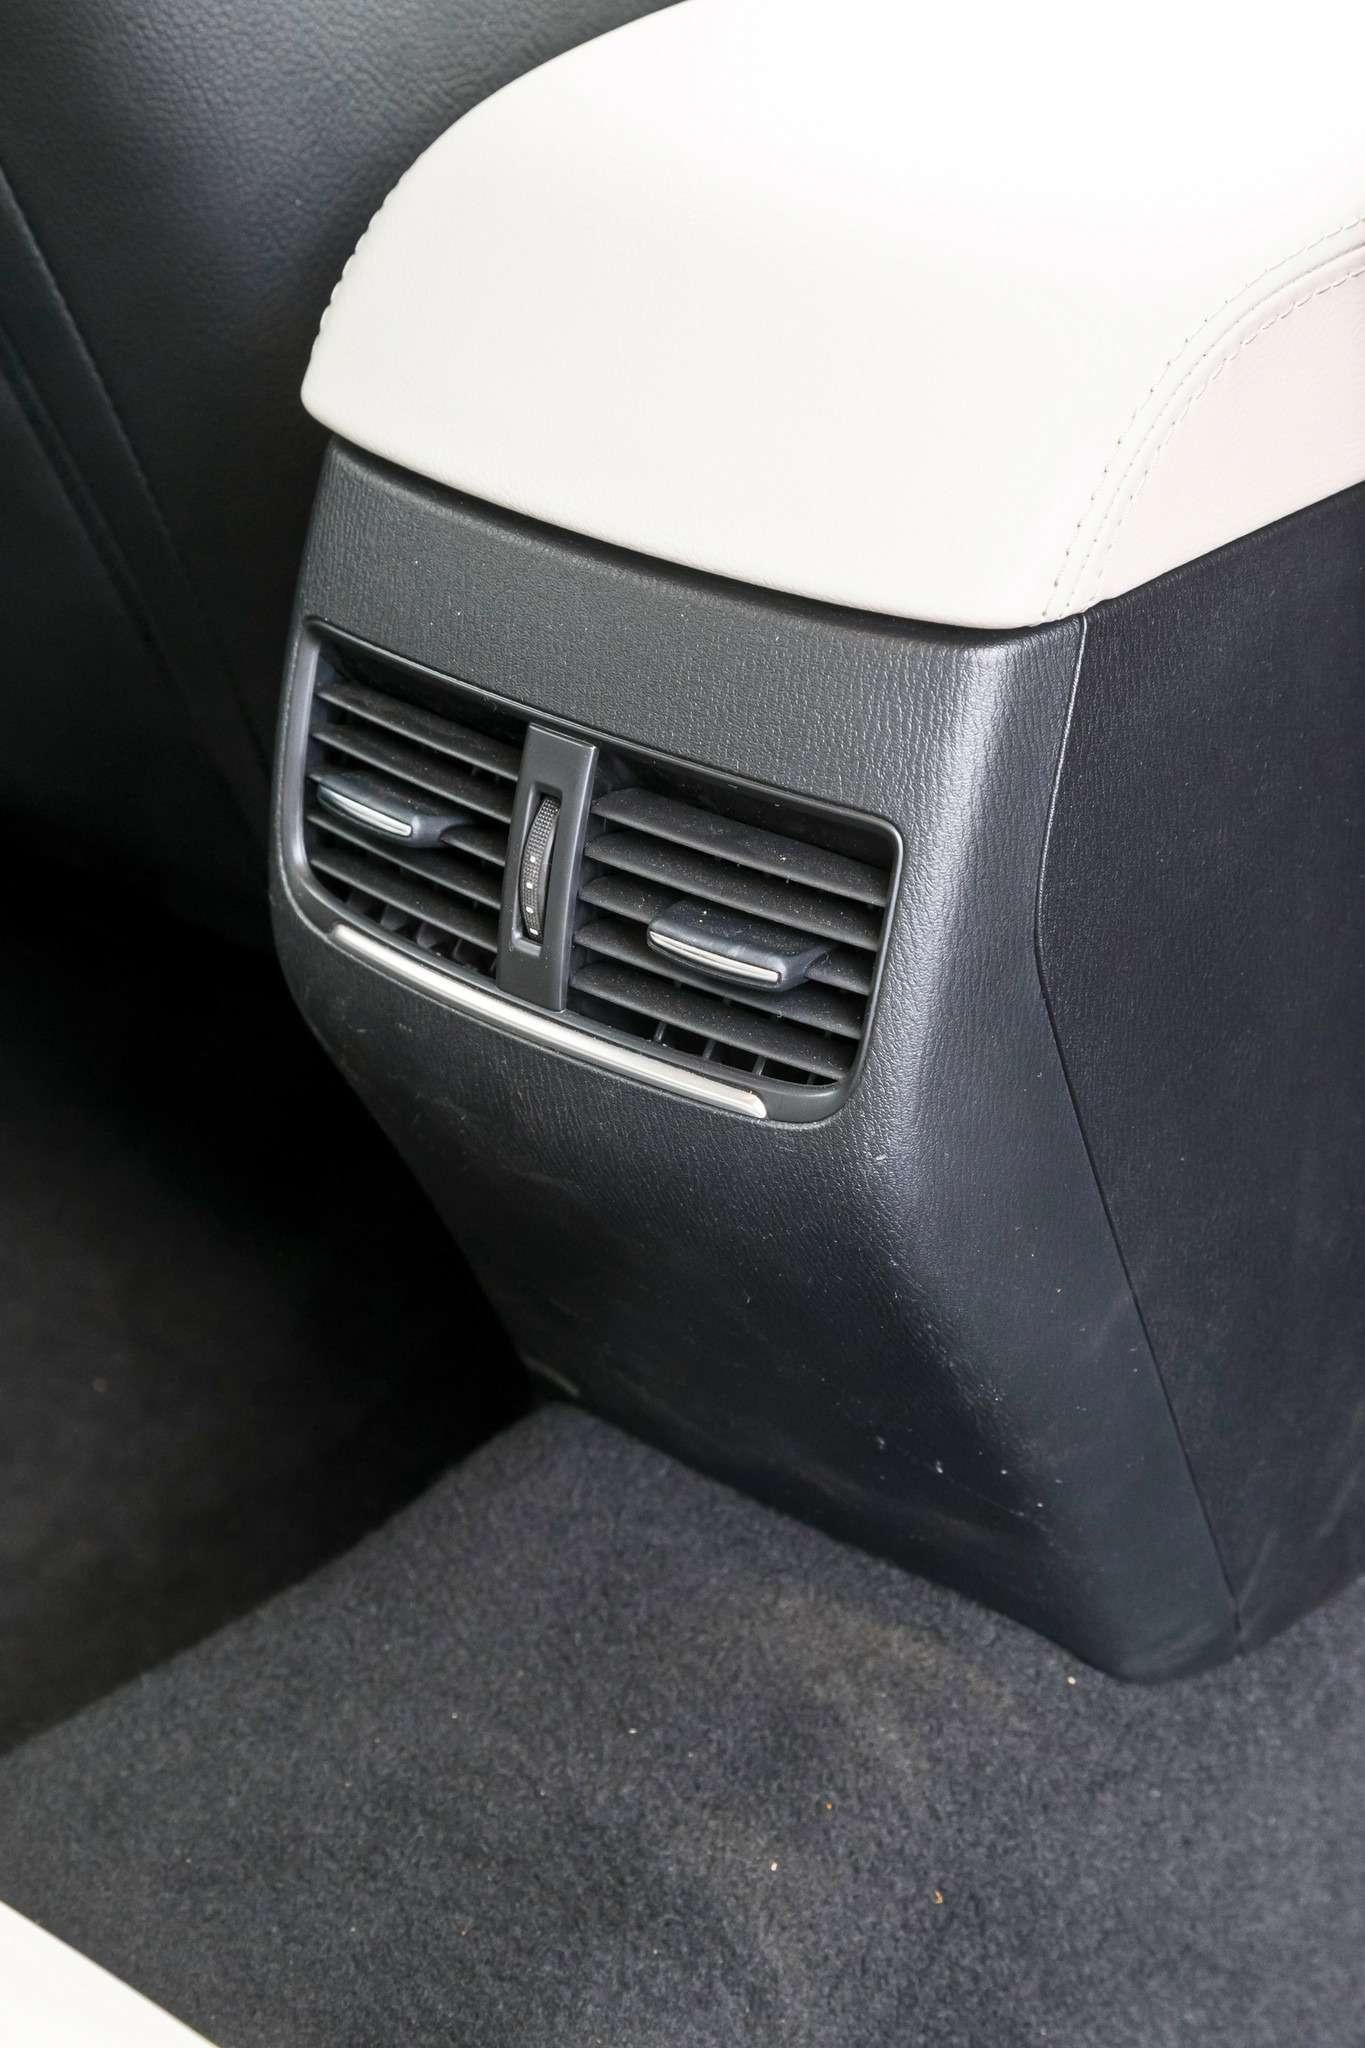 107-Passat_Mondeo_Mazda-6-zr09-15